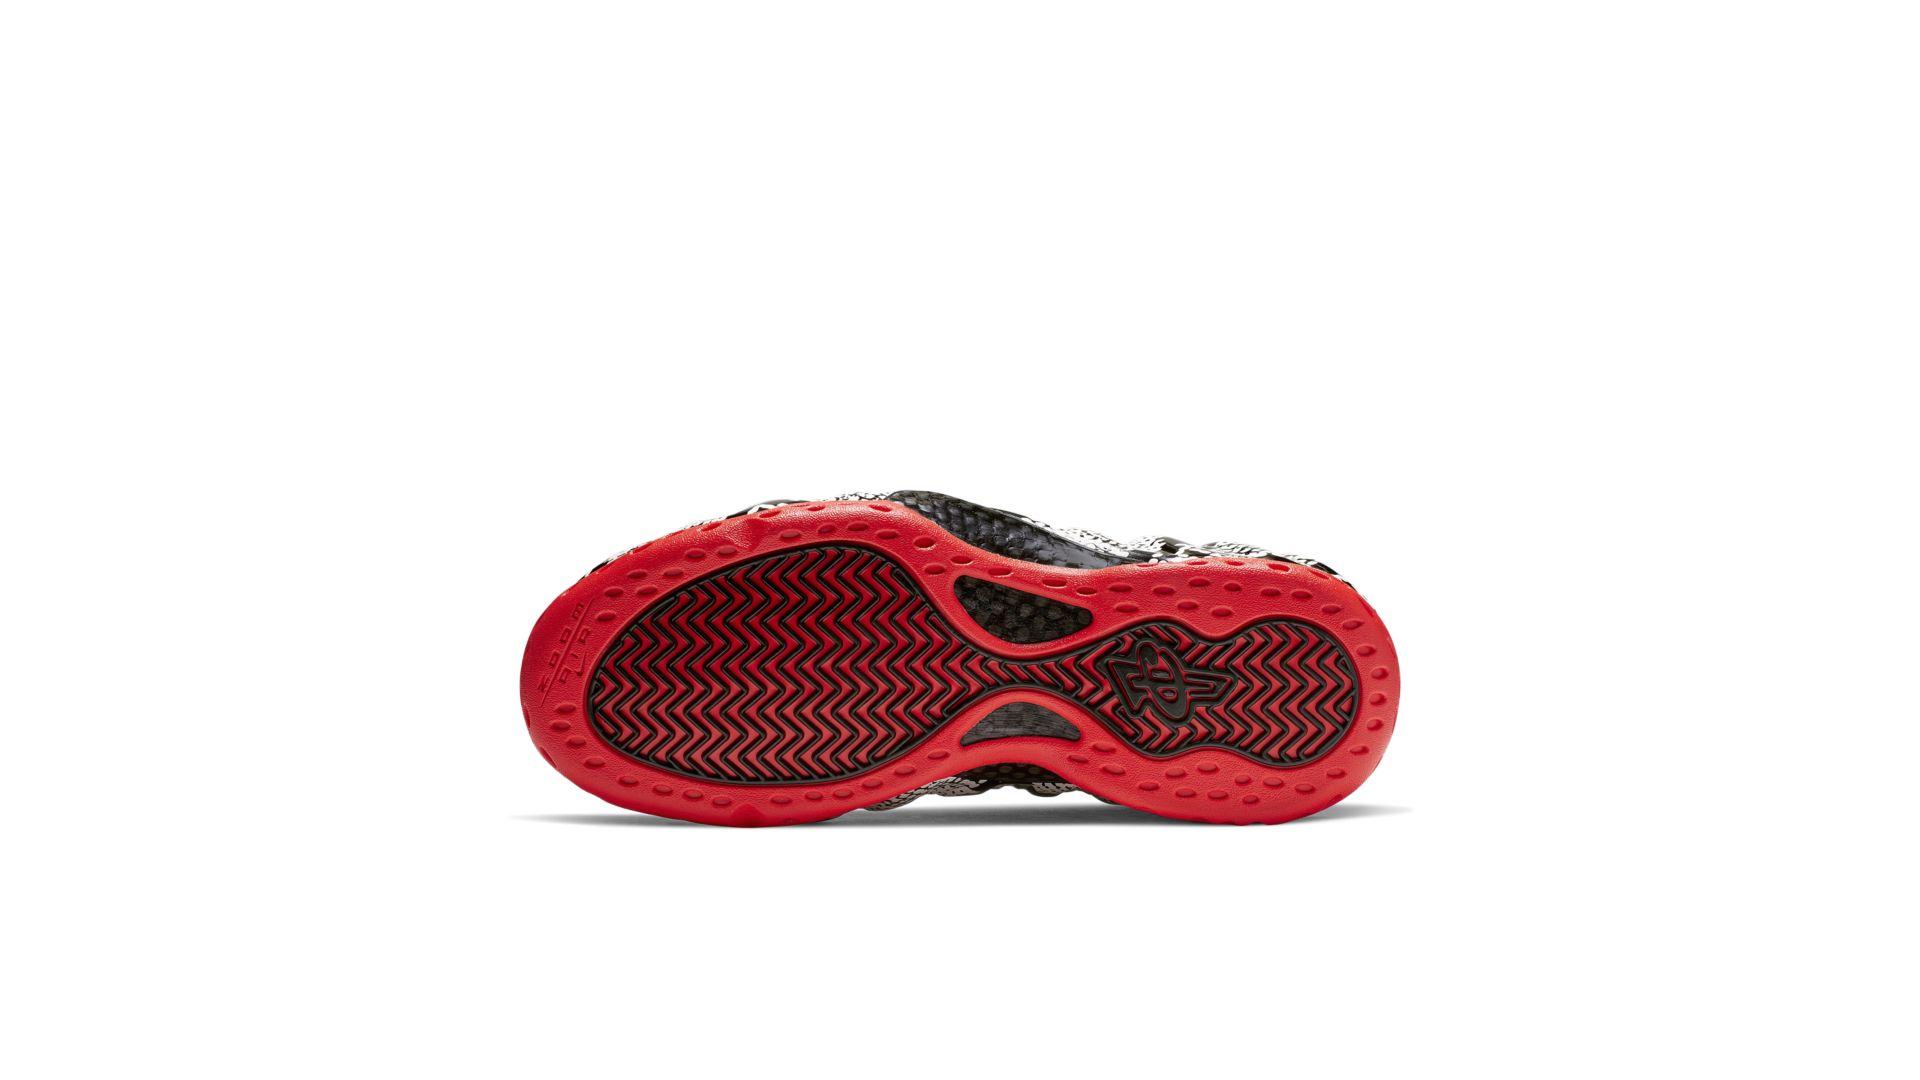 Nike Air Foamposite One Albino Snakeskin (314996-101)